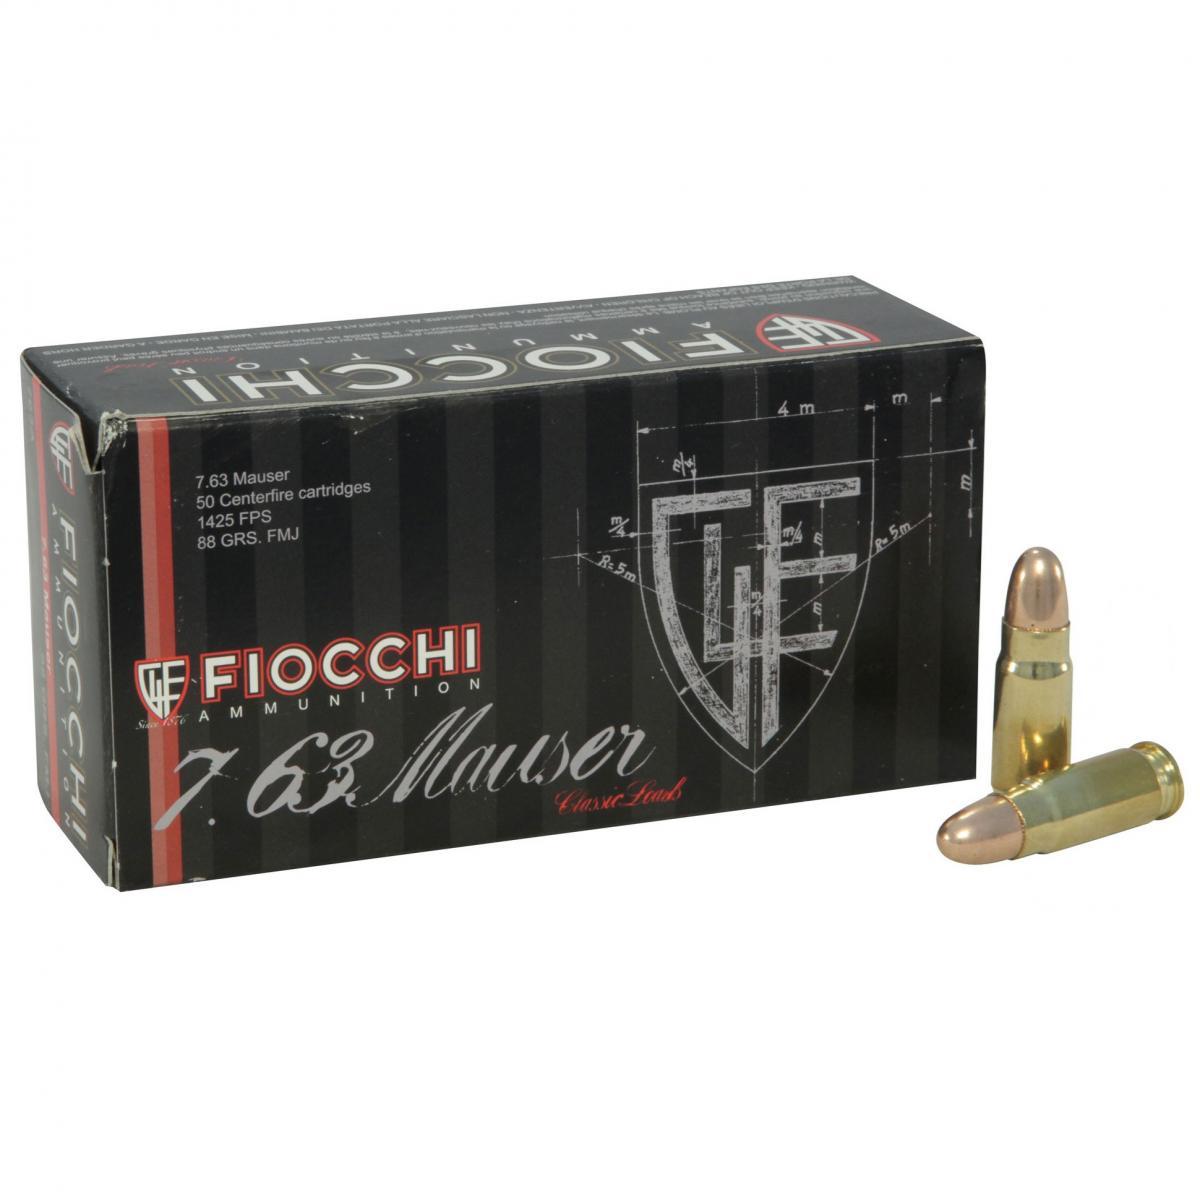 Boite de 50 cartouches FIOCCHI Cal. 7.63 Mauser